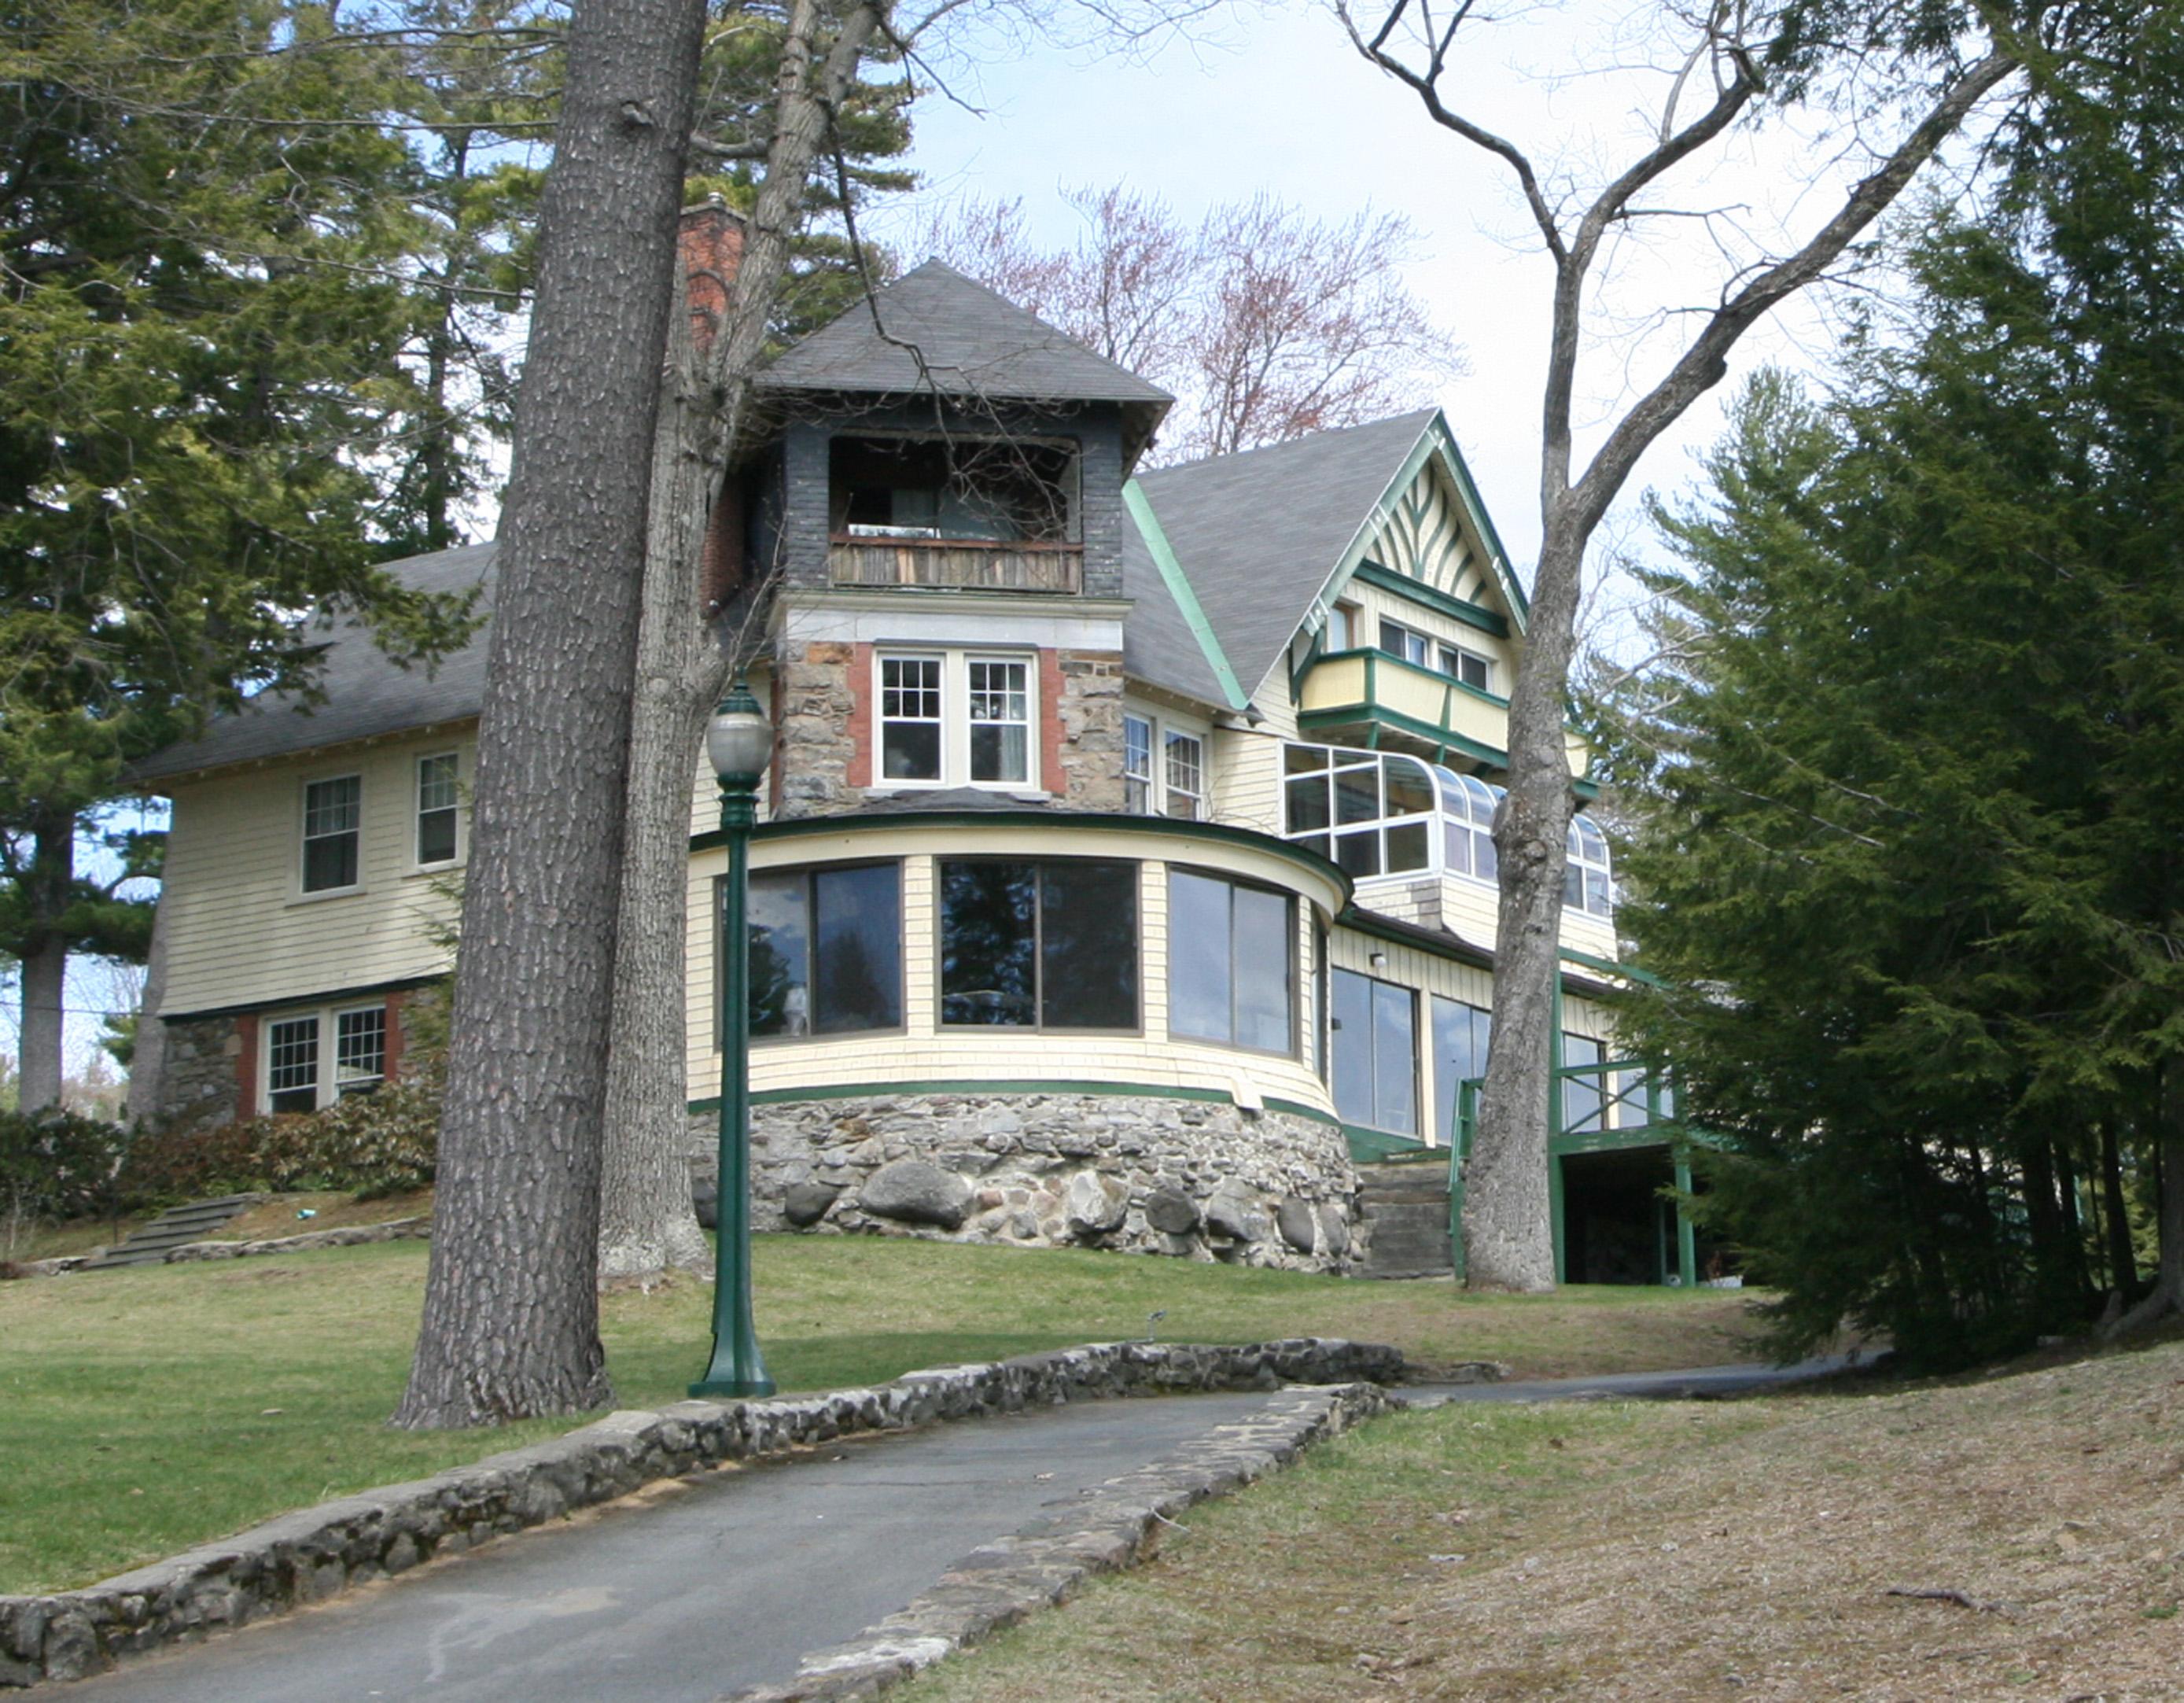 The Denison Mansion